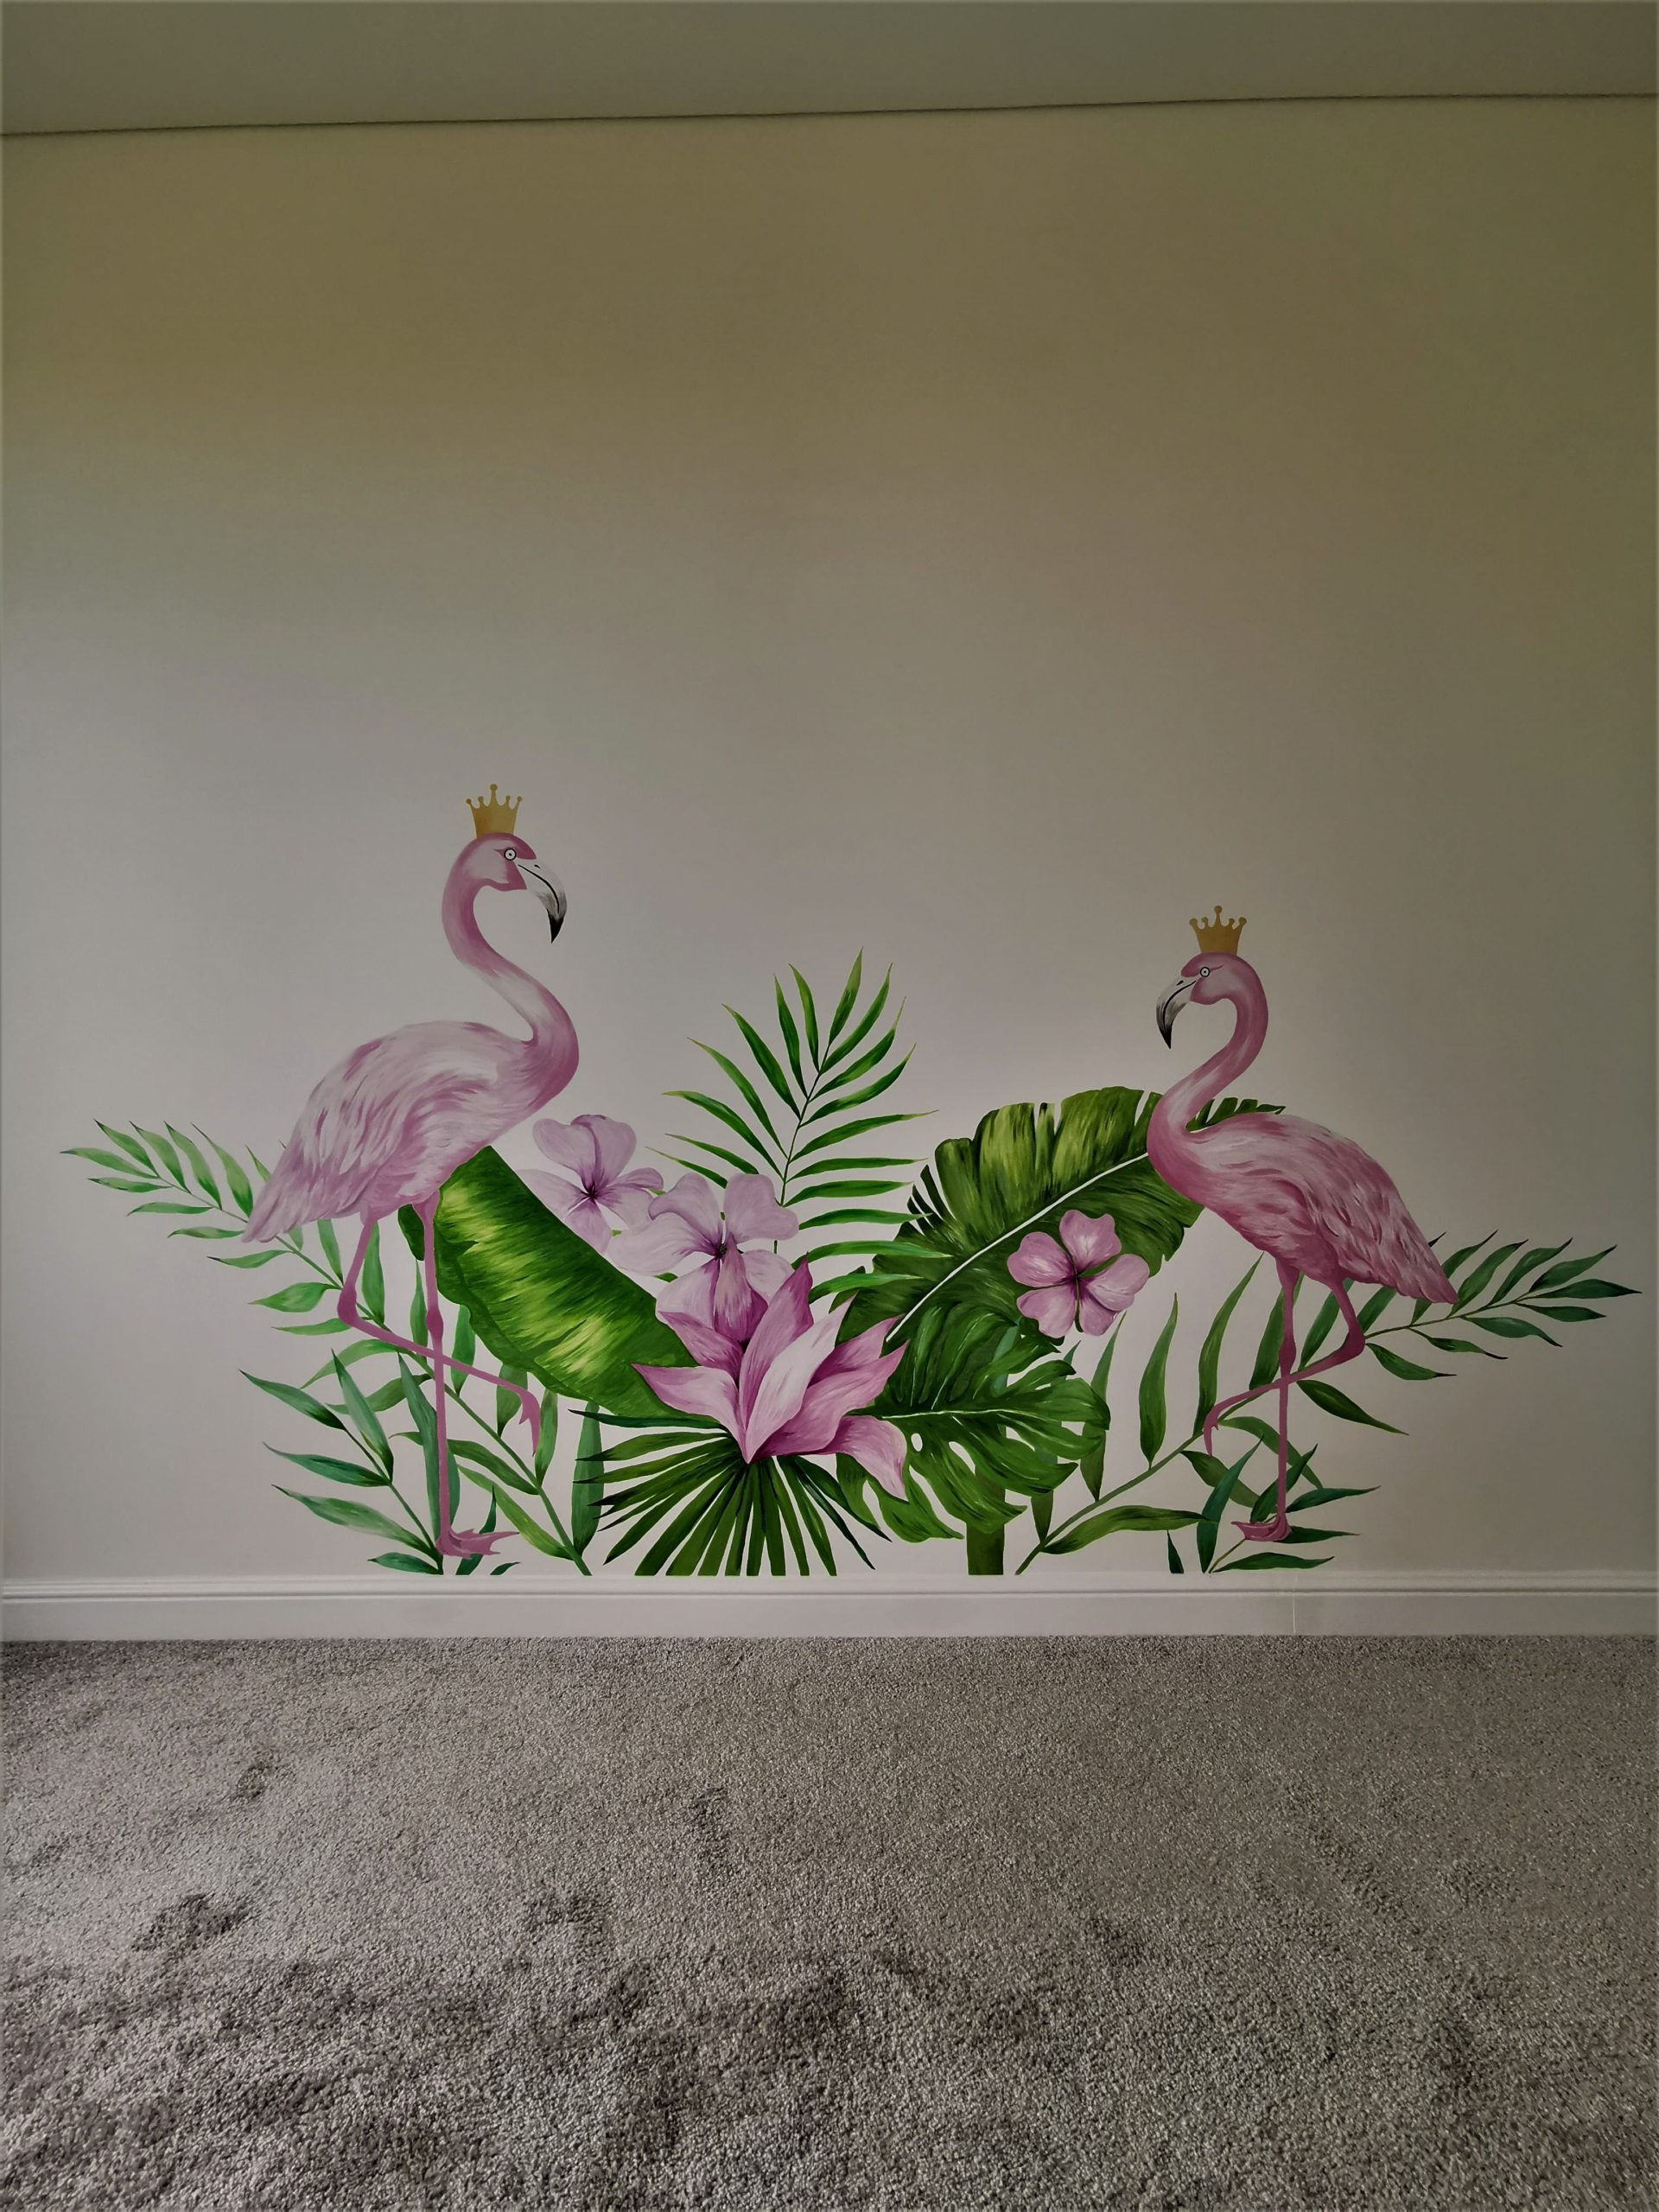 menine-kuryba-sienu-dekoravimas (16)